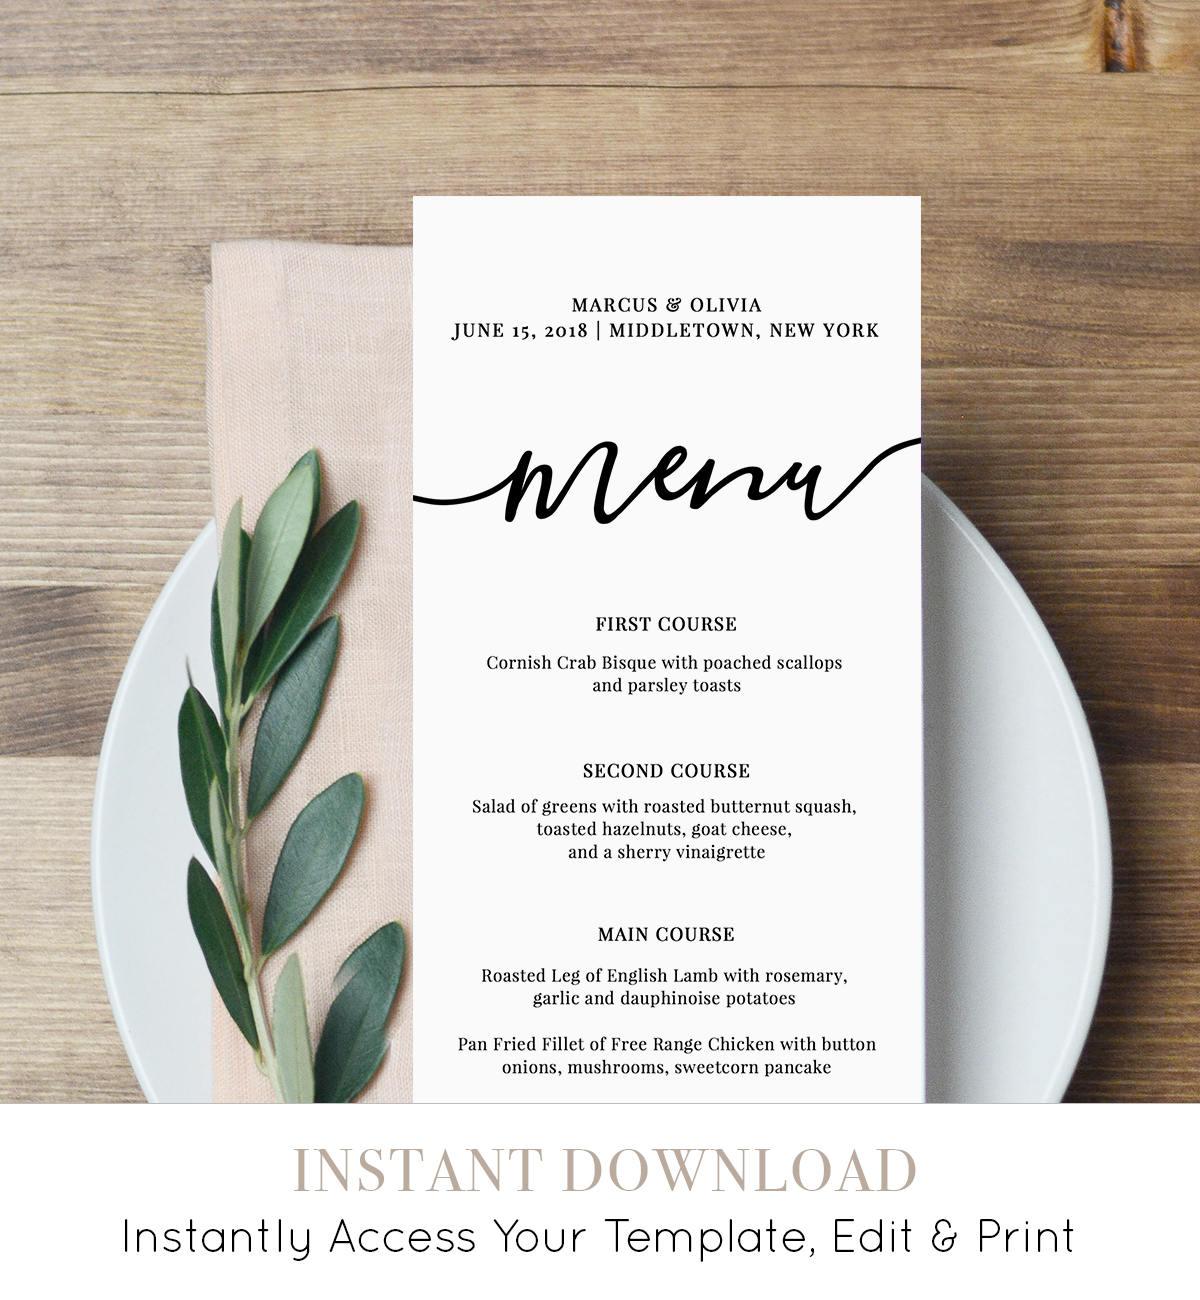 wedding menu templates free